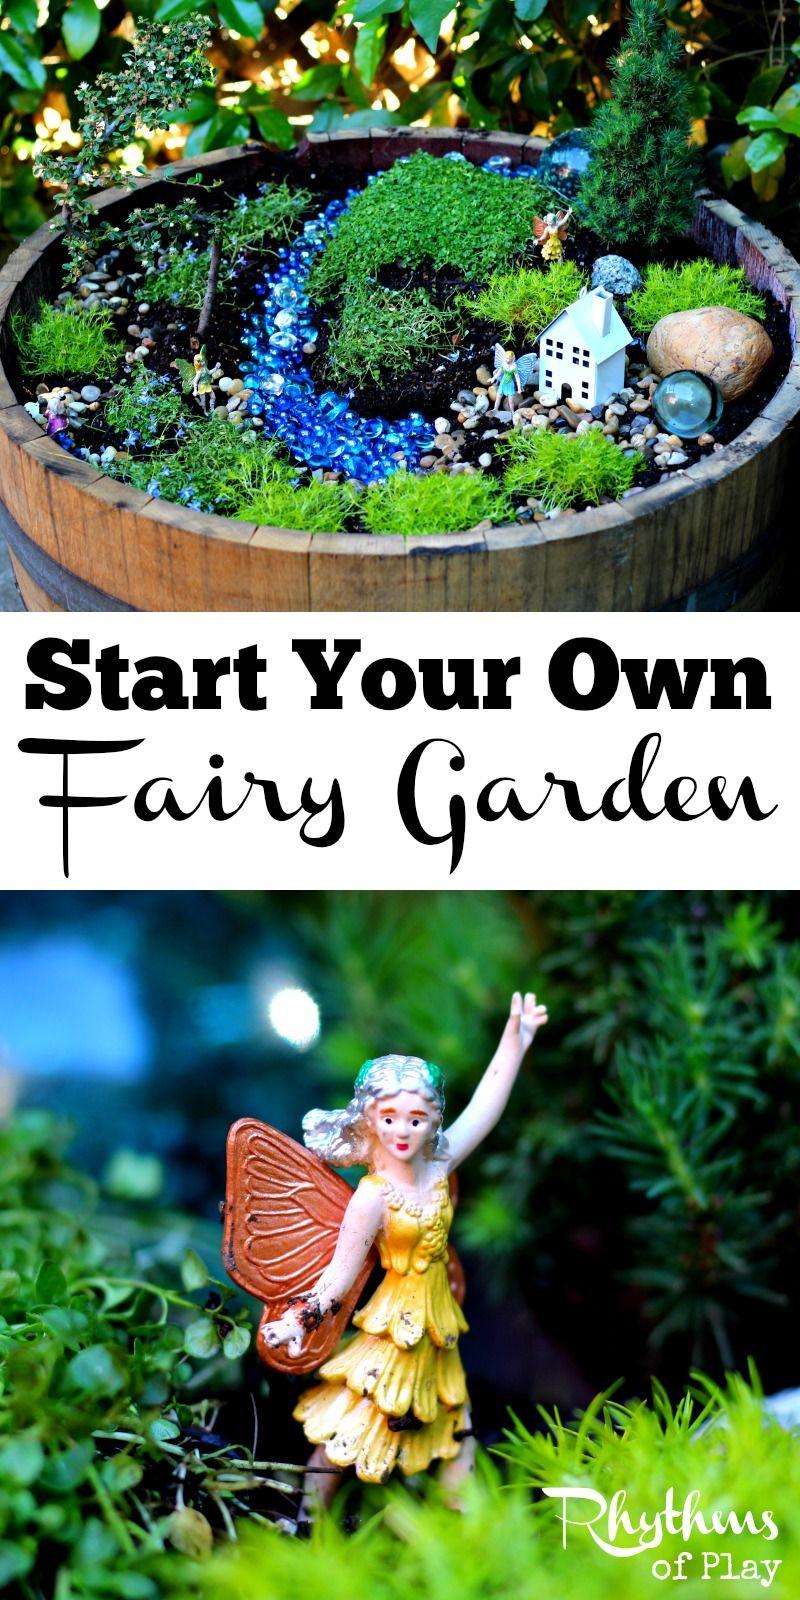 Start Your Own Fairy Garden Gardens Decks and Backyards